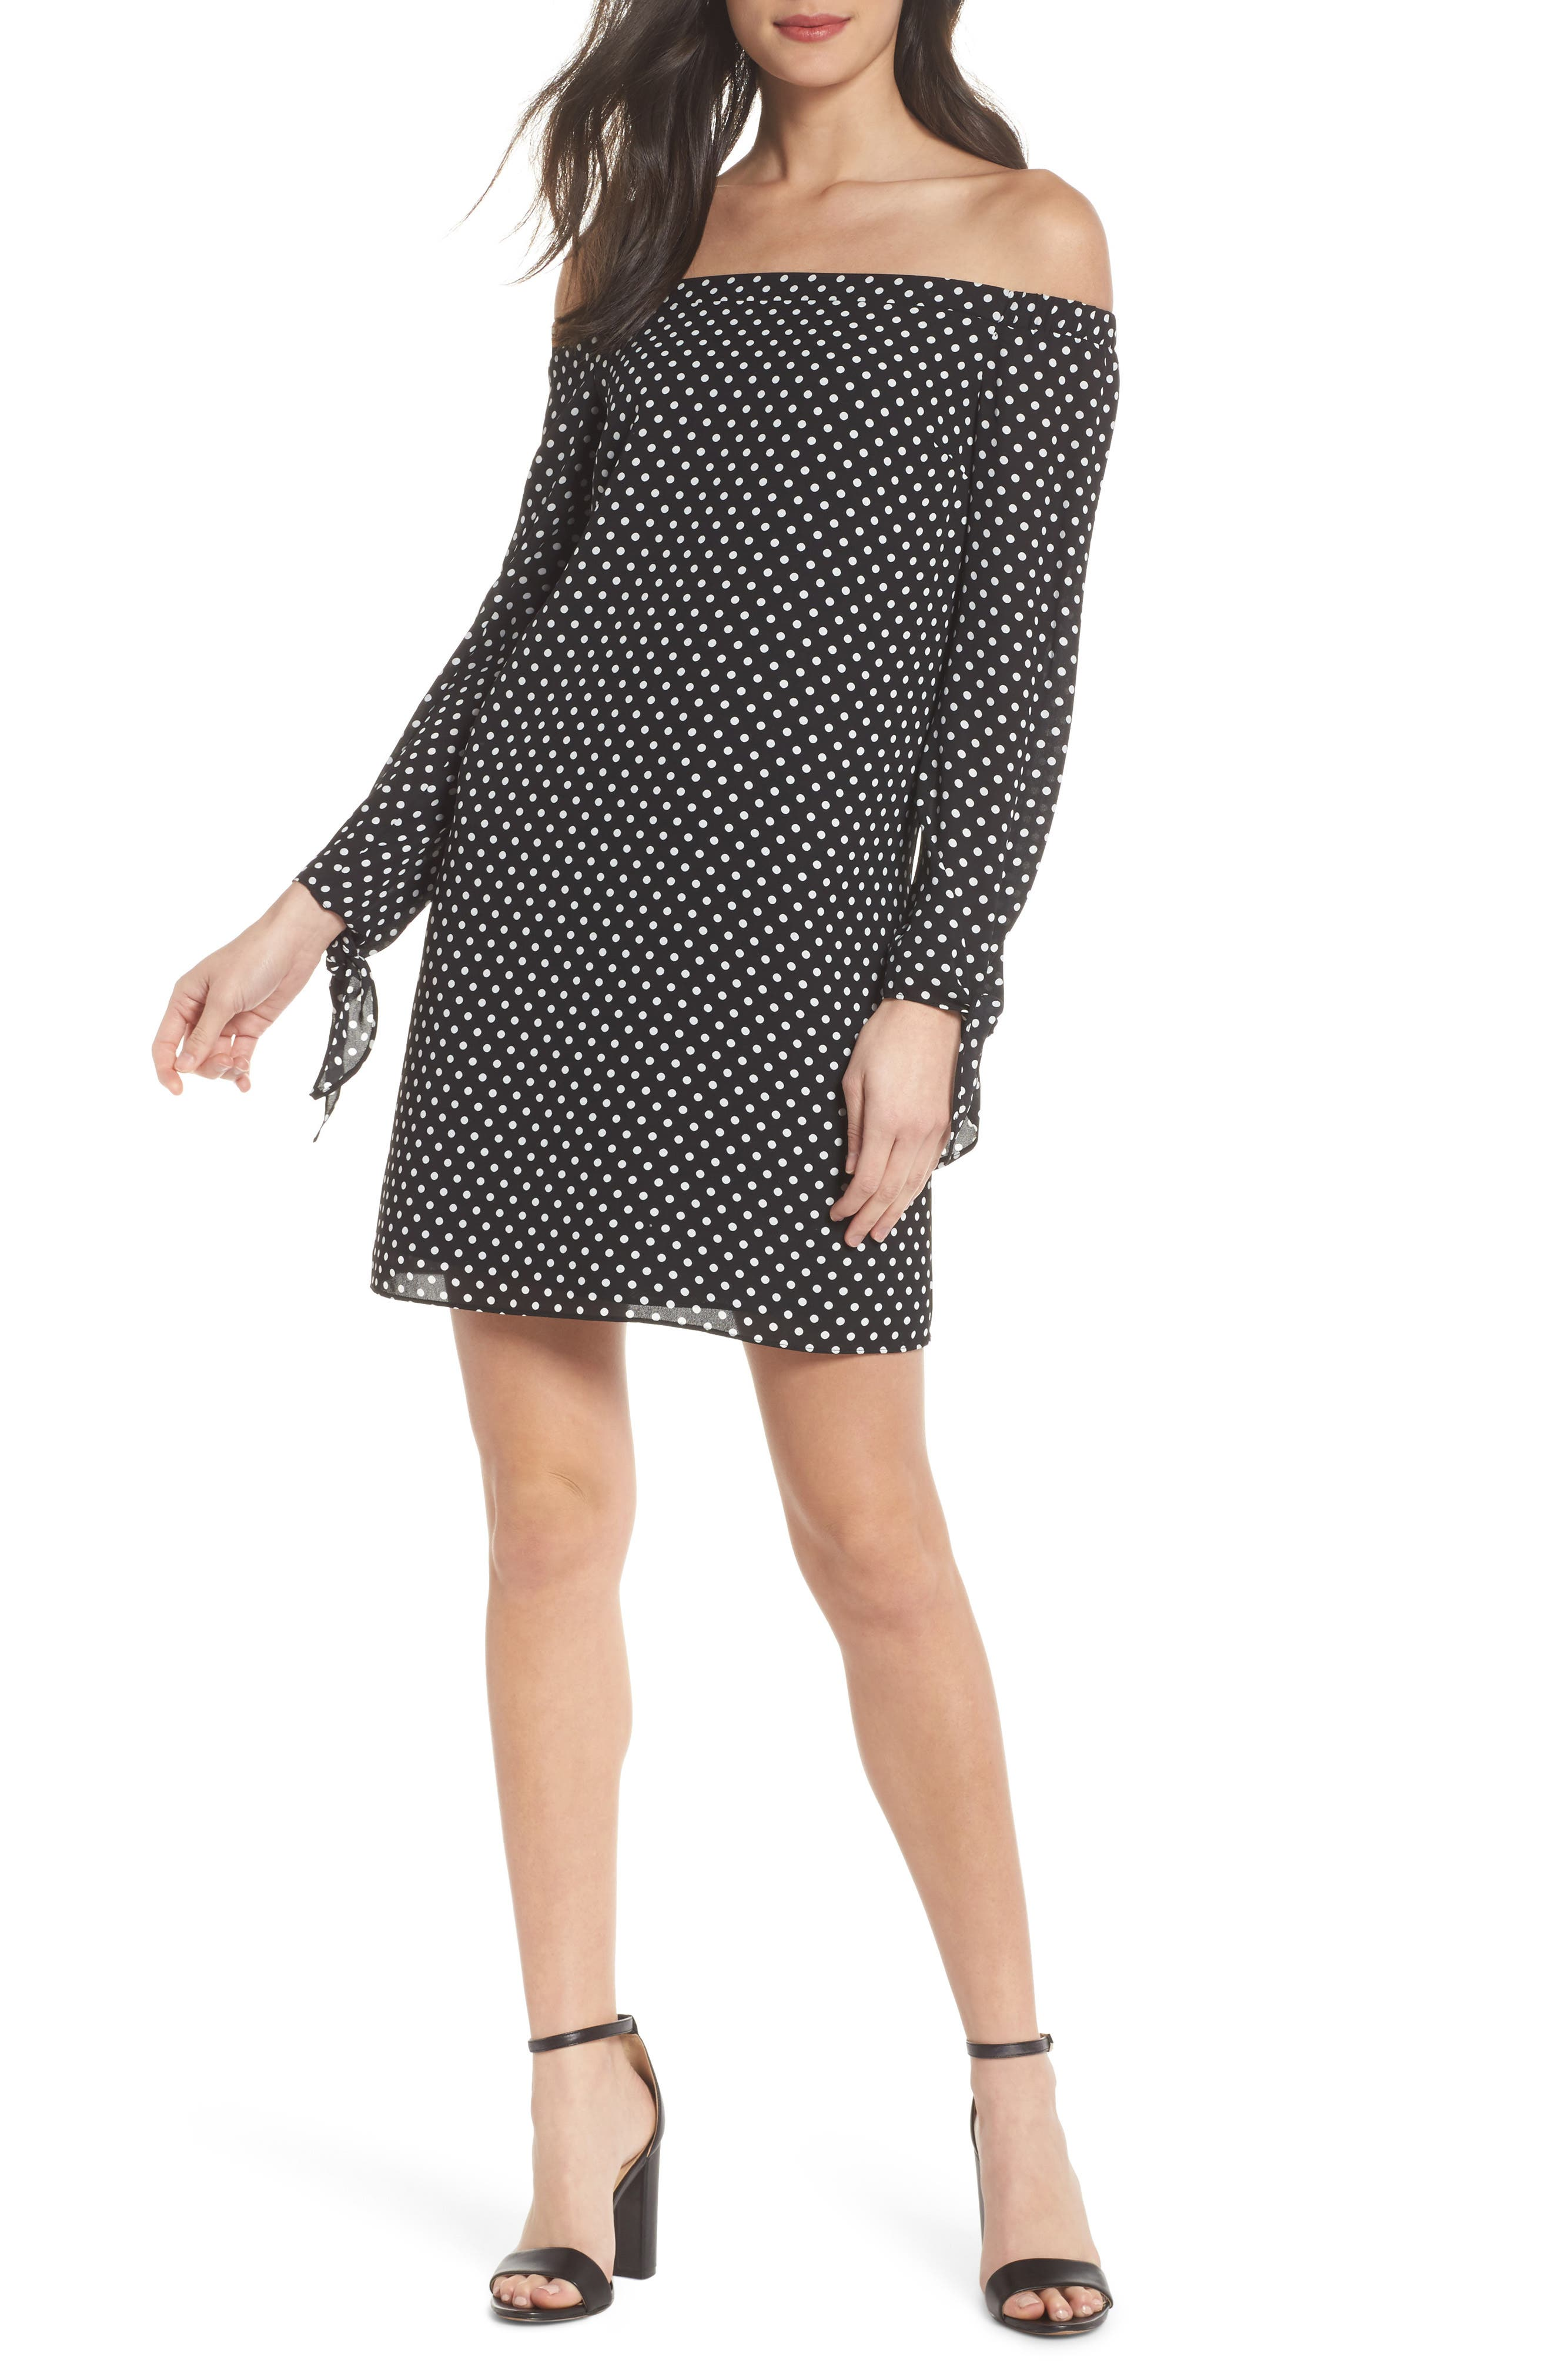 Polka Dot Off the Shoulder Minidress,                             Main thumbnail 1, color,                             Black/ White